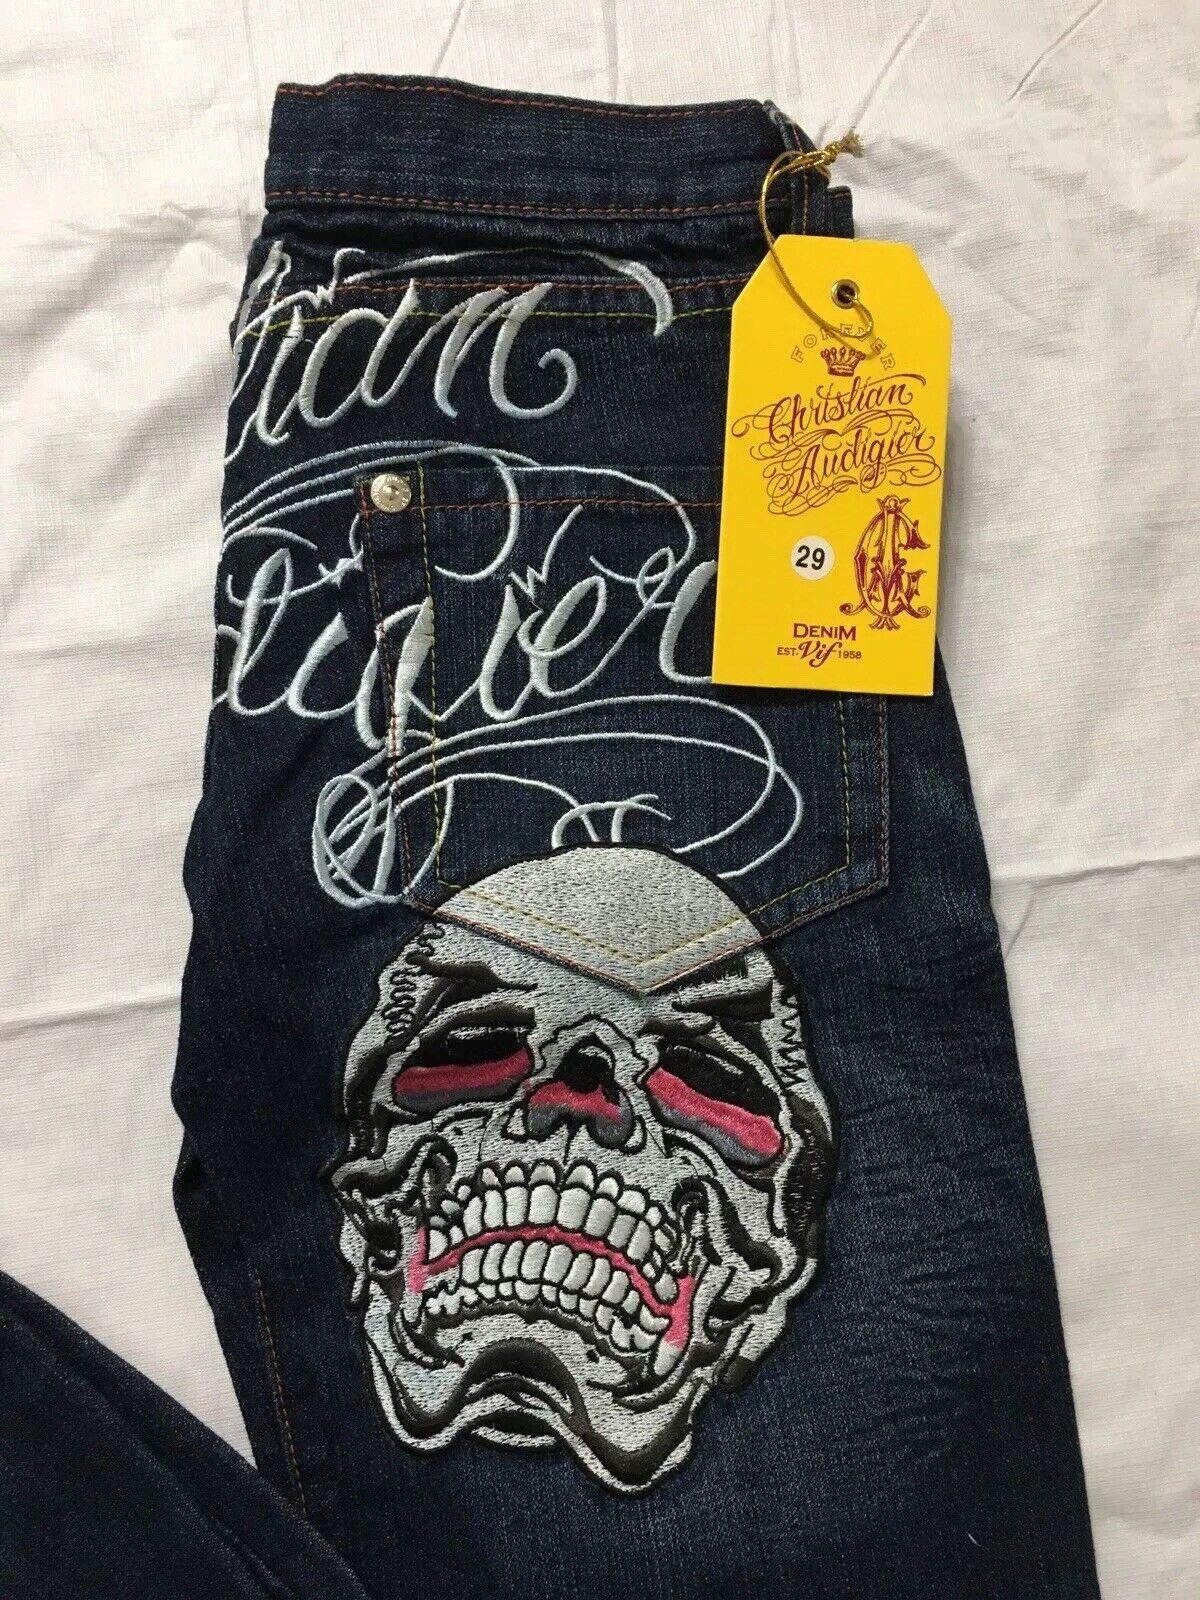 Christian Audigier Jeans Womens Size 29 Skull Straight Leg  Distressed NWT